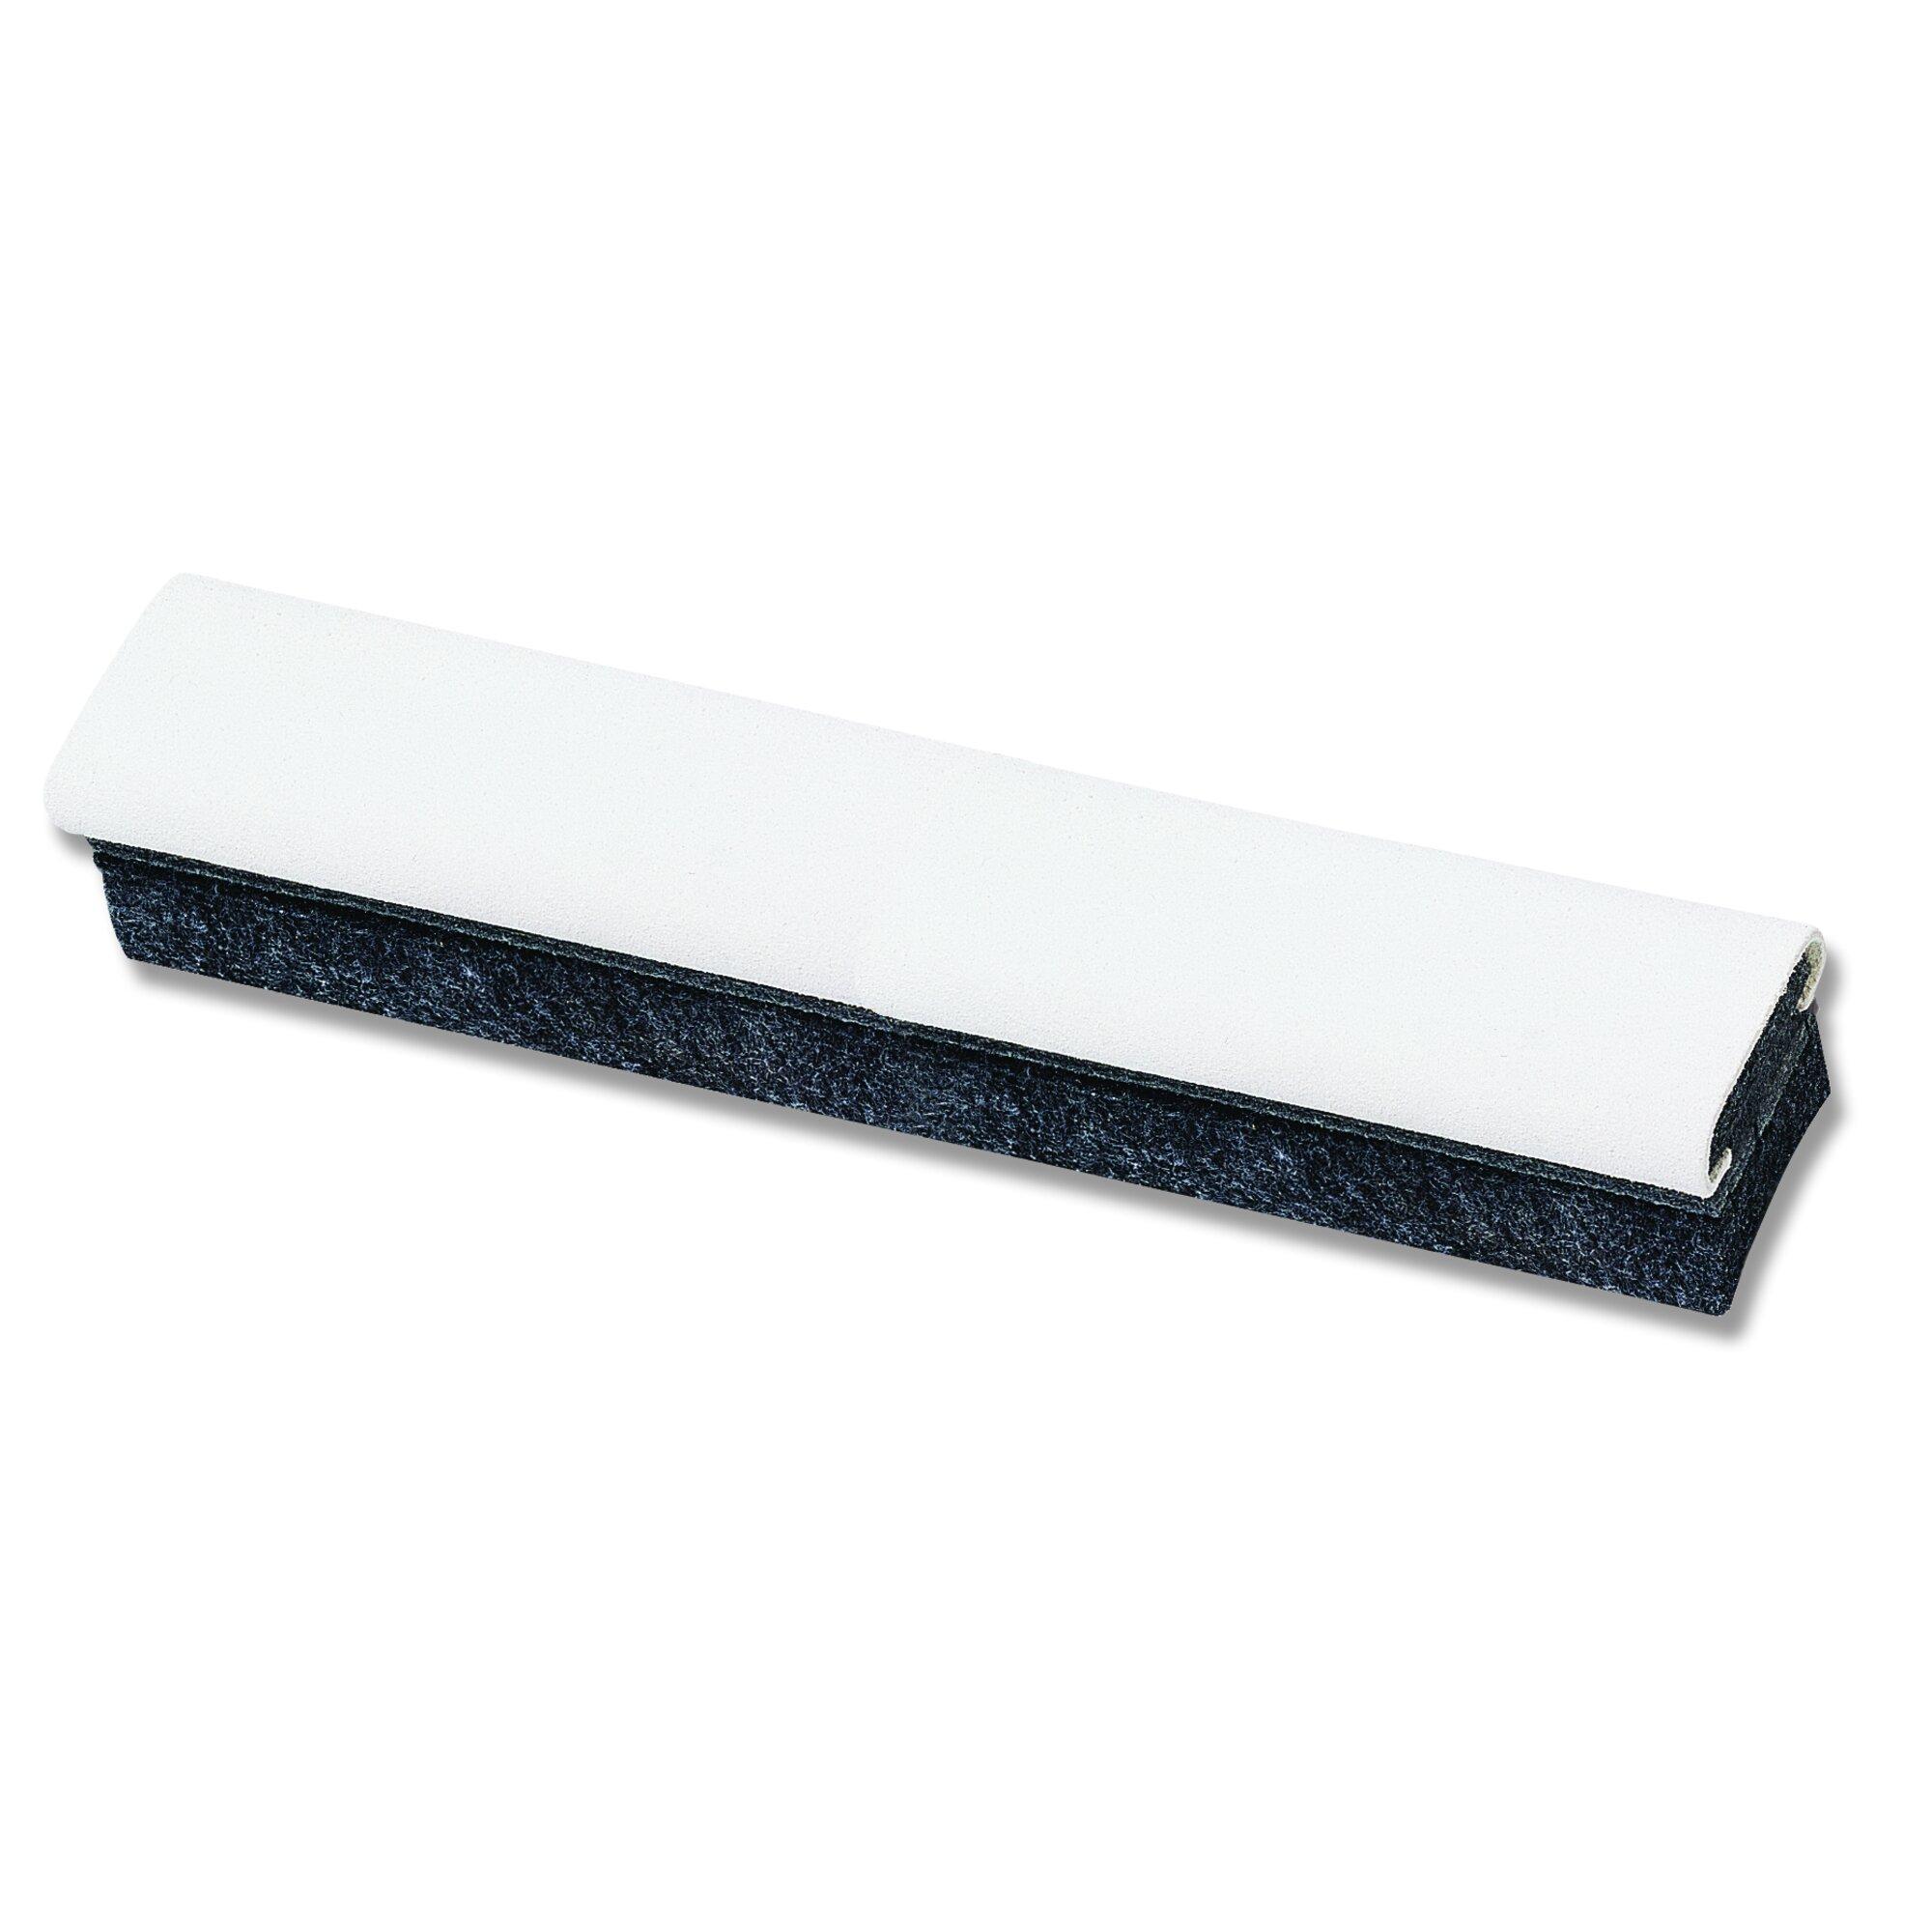 Deluxe Chalkboard Eraser/Cleaner, Felt, 12w x 2d x 1 5/8h